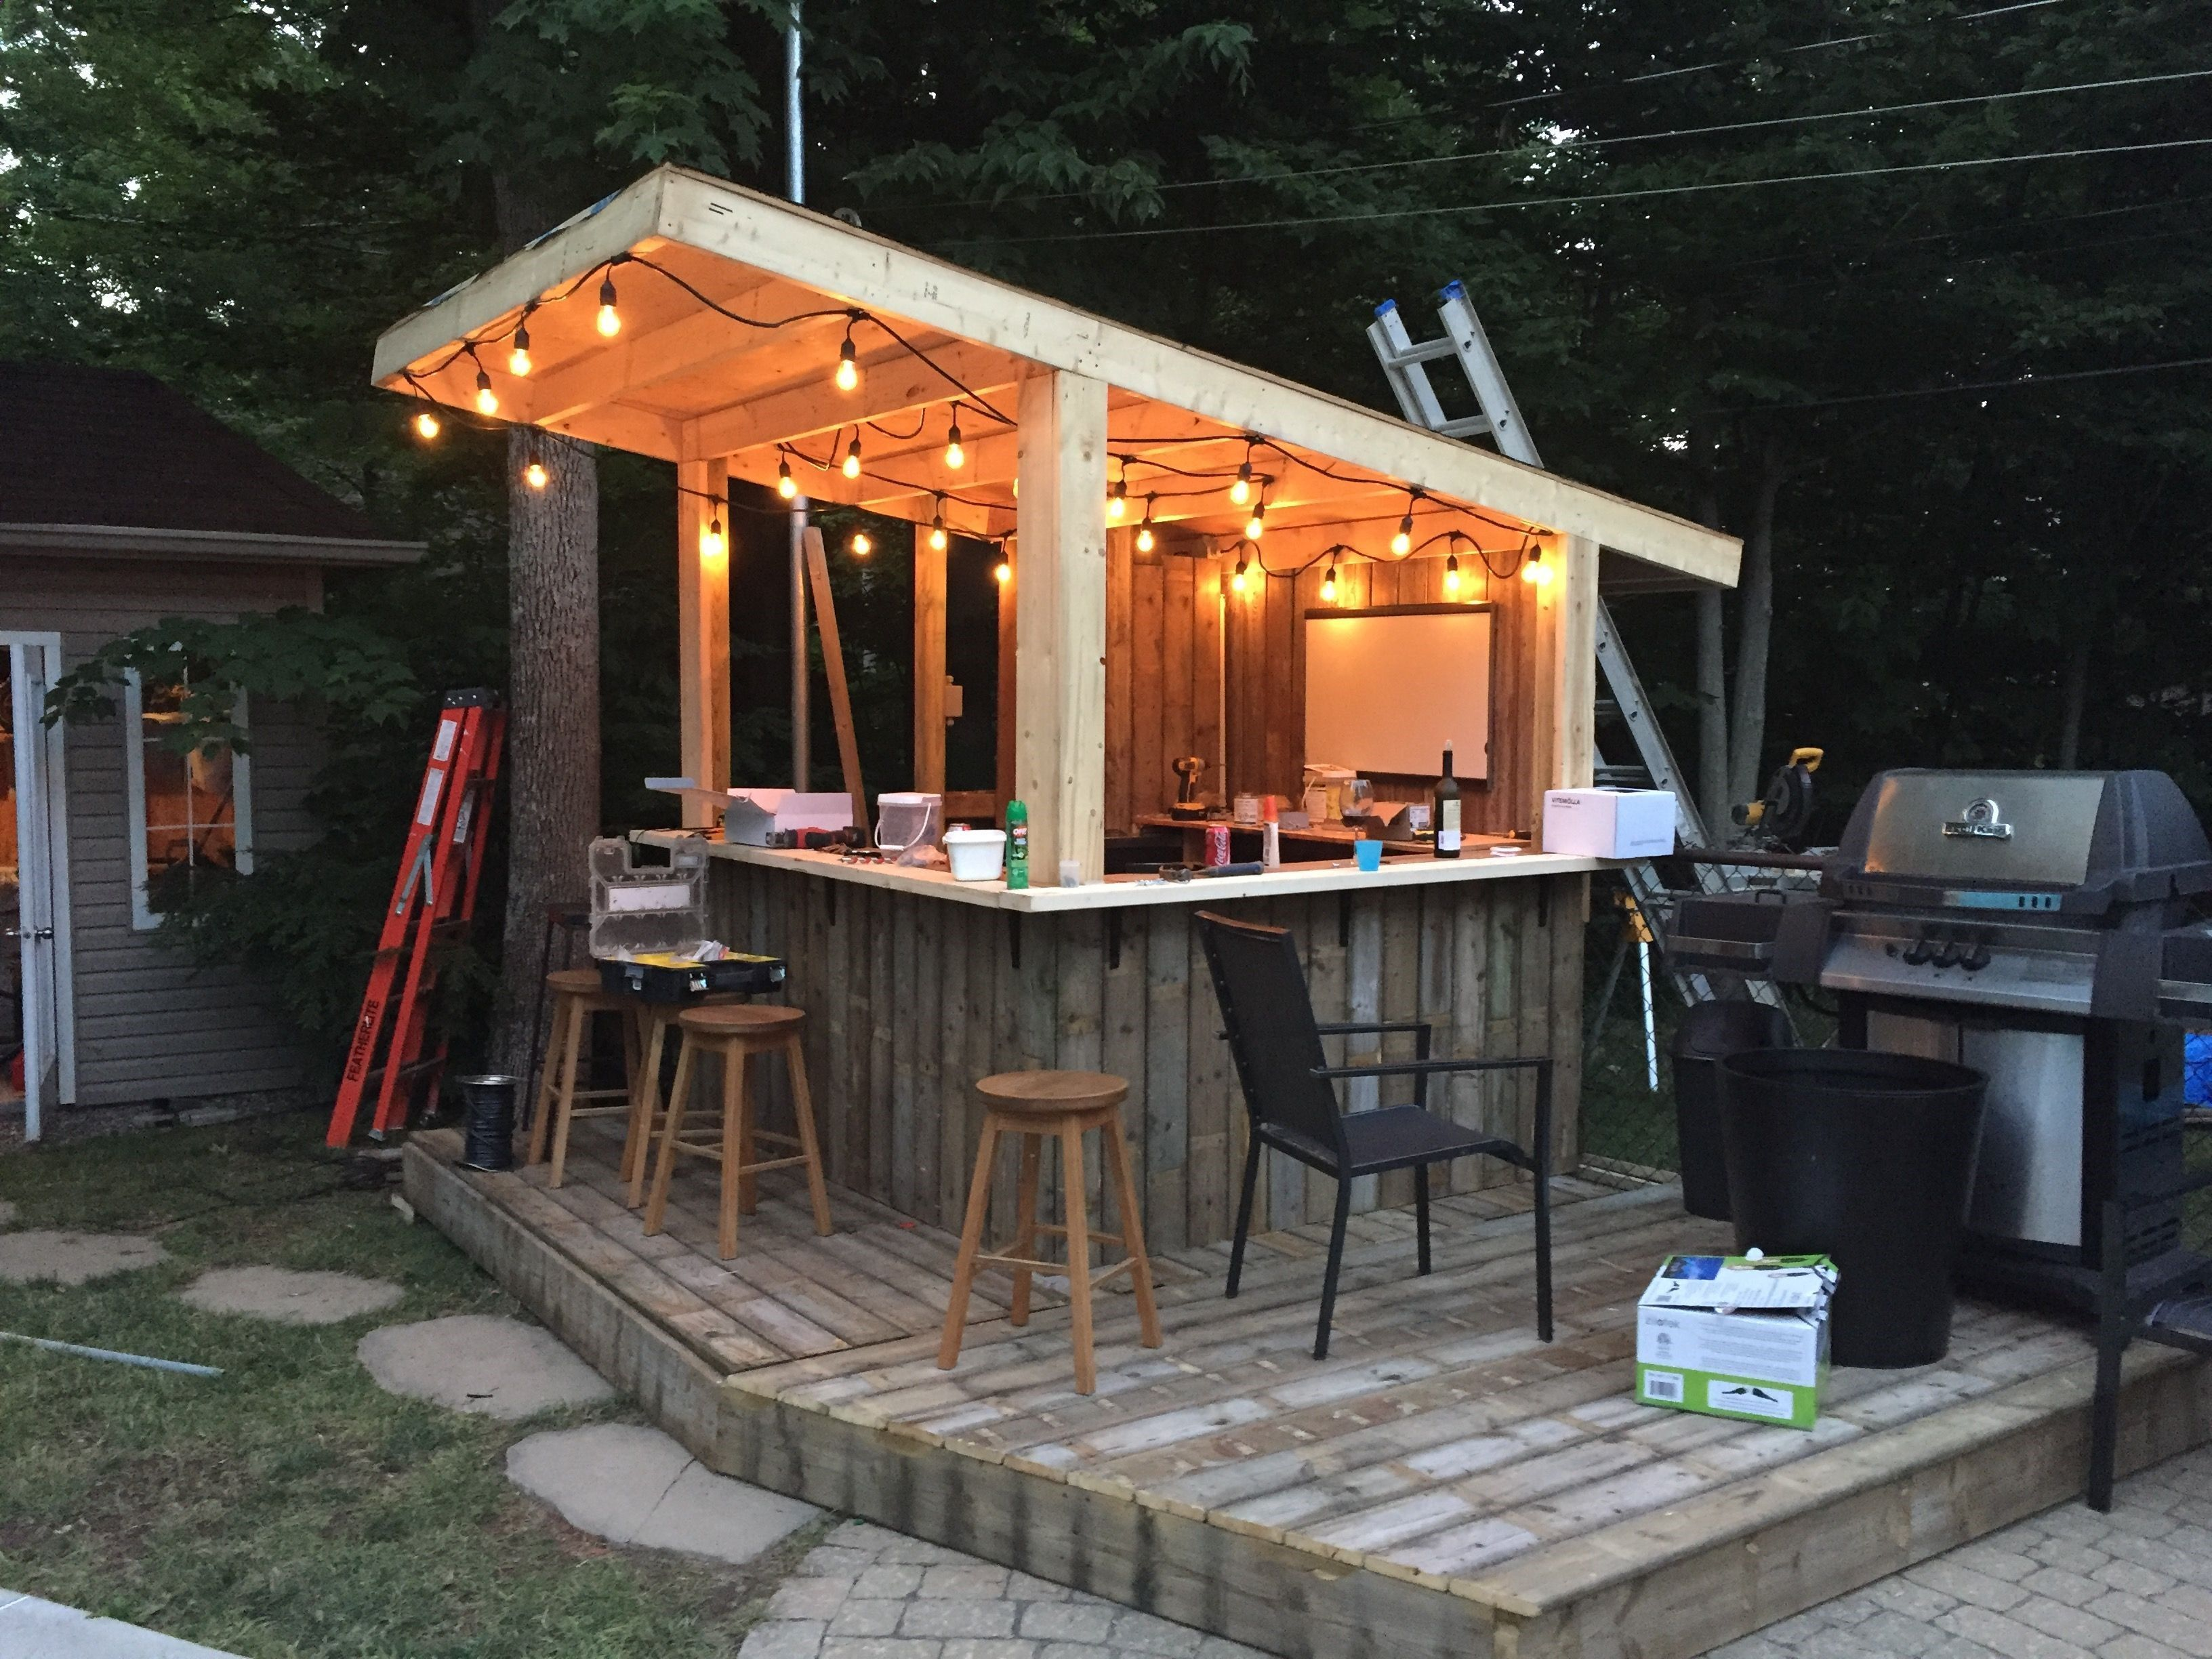 Shed Diy Tiki Bar Backyard Pool Bar Built With Old Patio